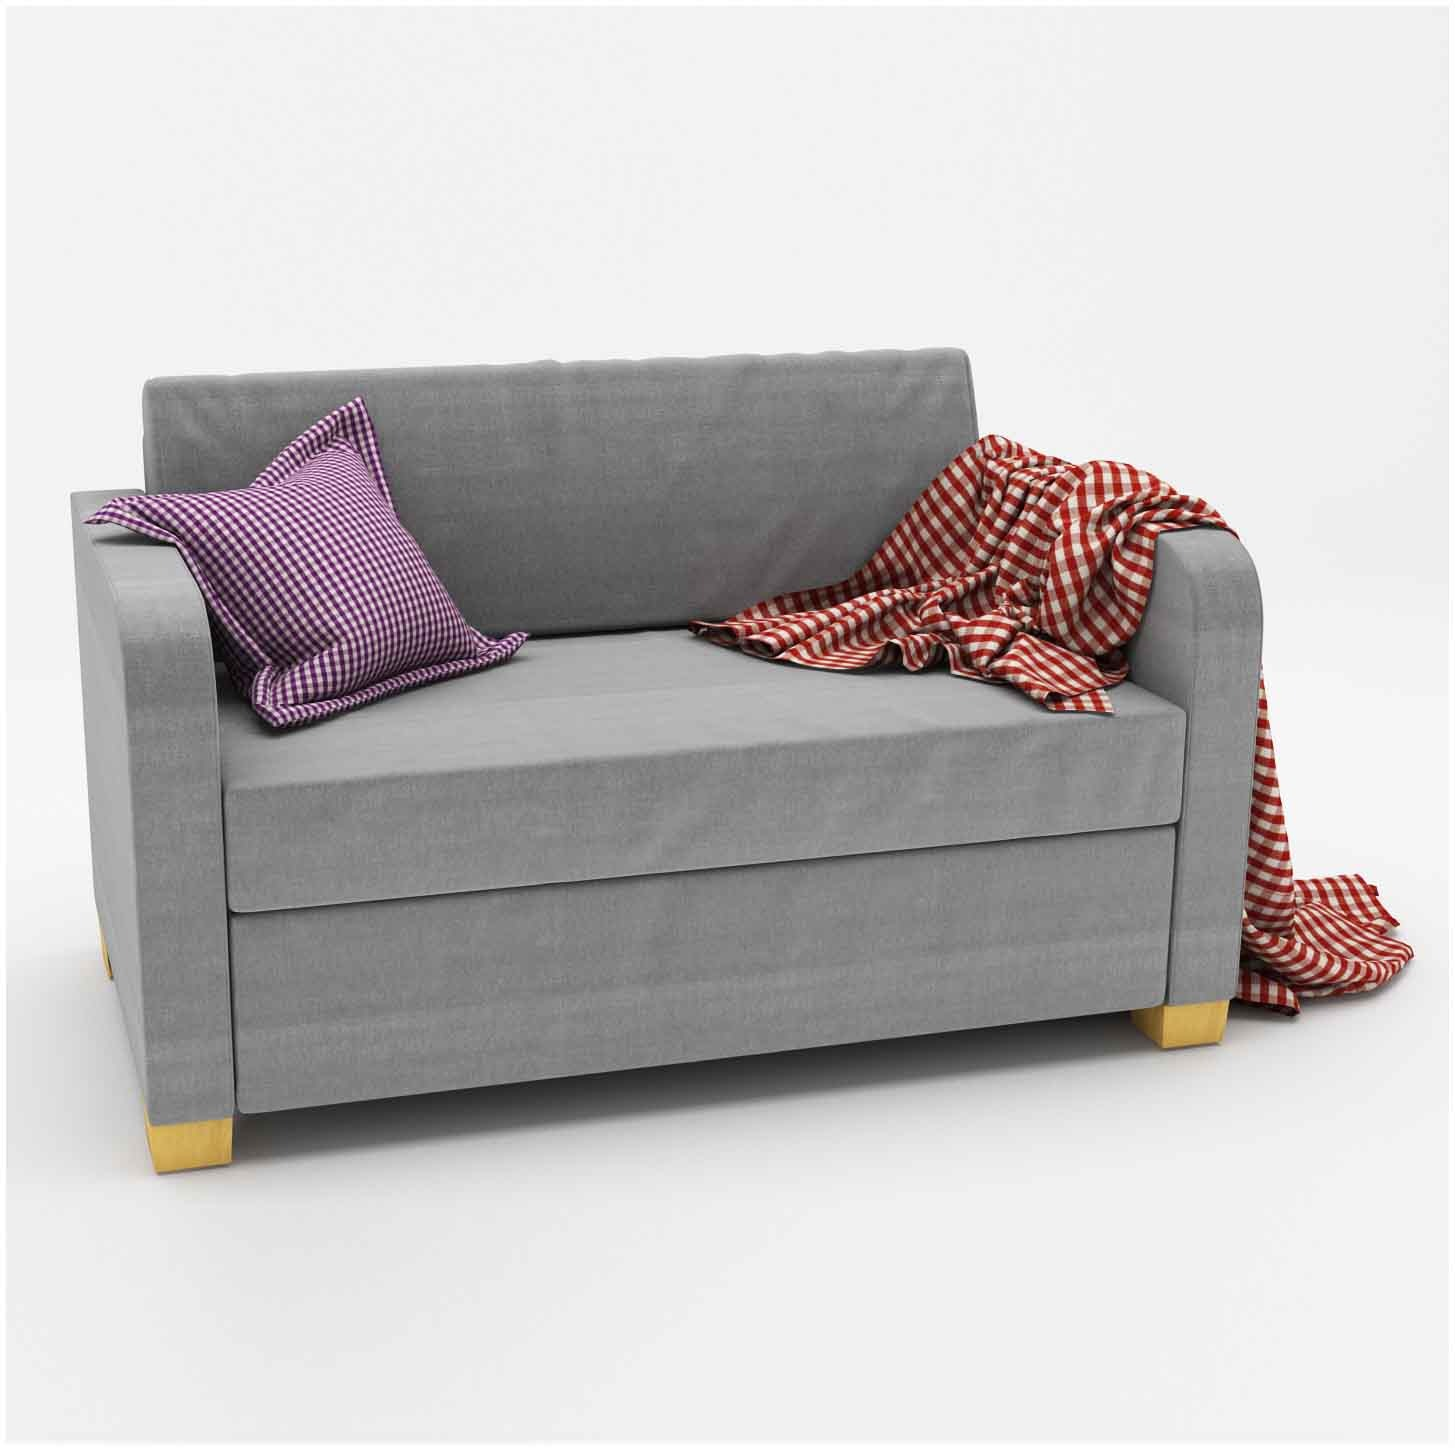 solsta sofa bed ransta dark gray review jackson brantley reviews talentneeds